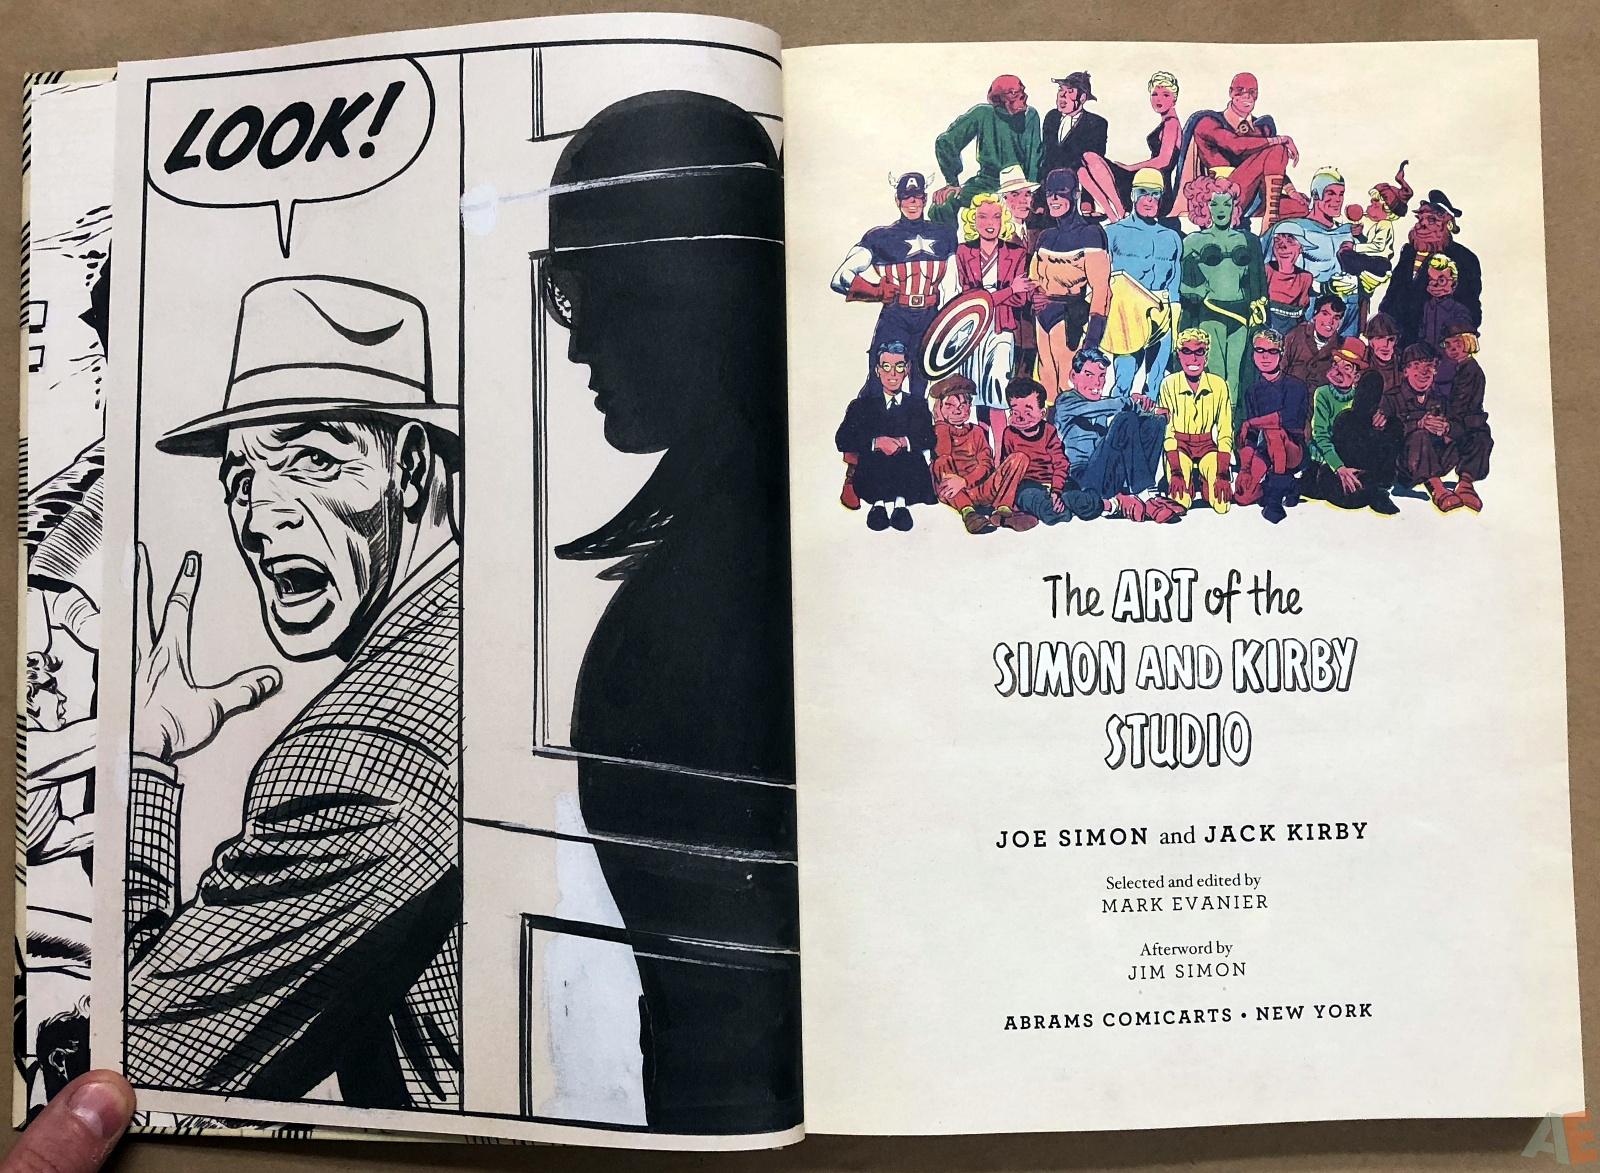 The Art of the Simon And Kirby Studio